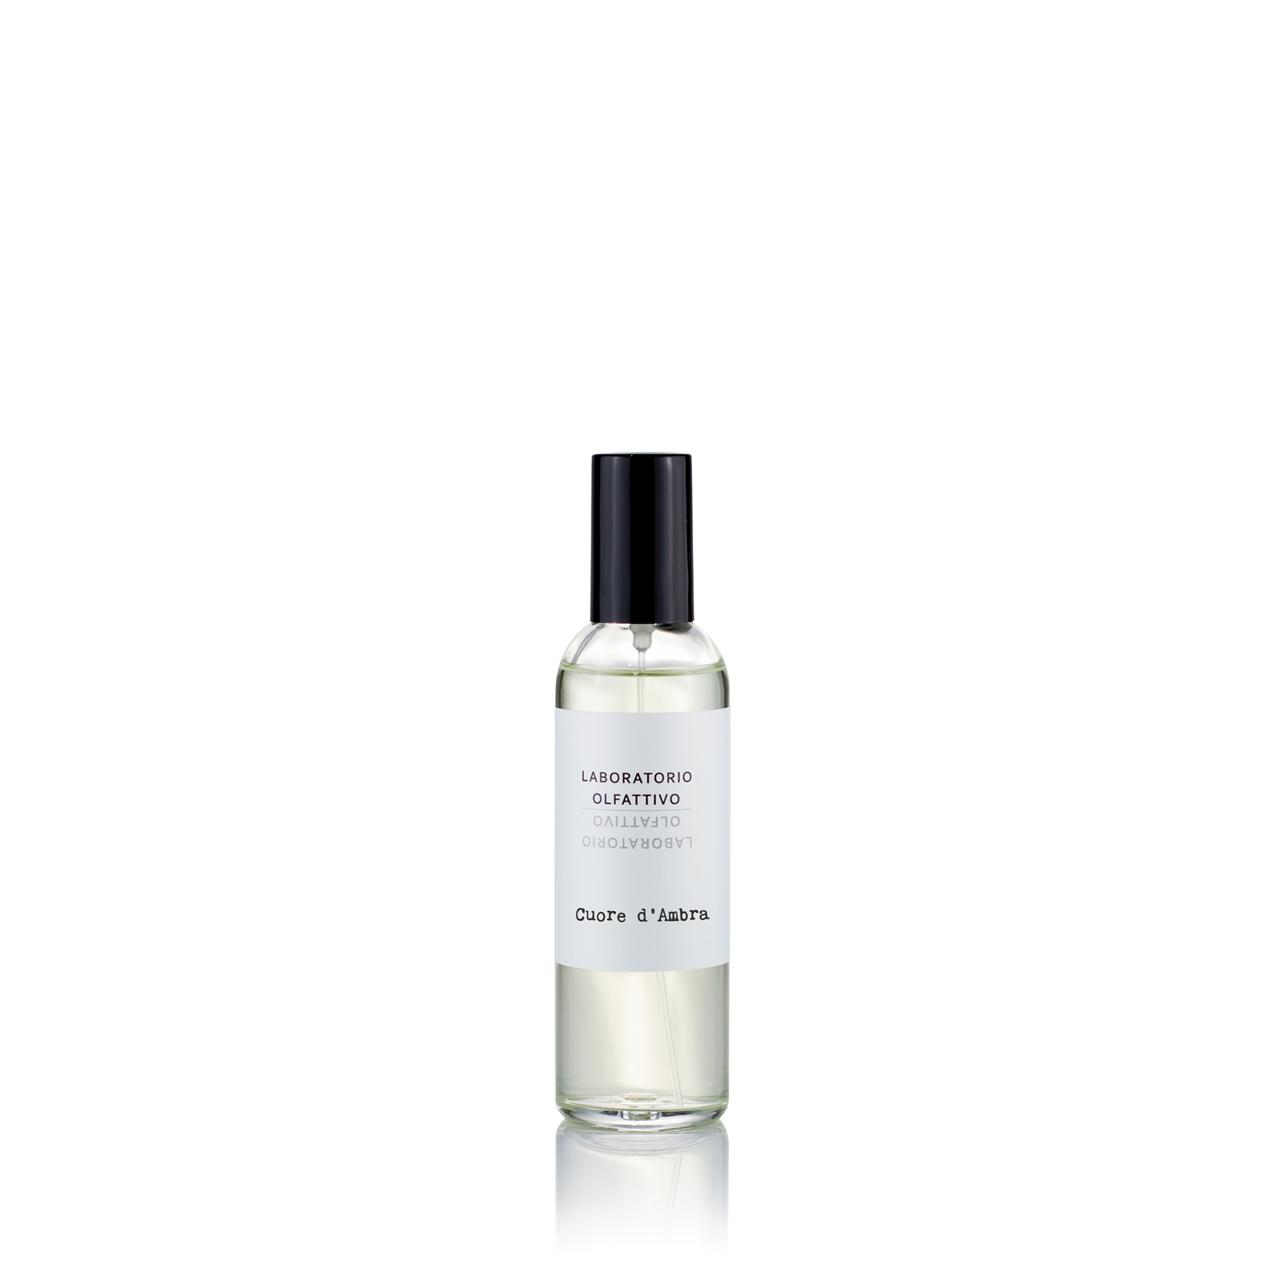 CUORE D'AMBRA - Room Fragrance